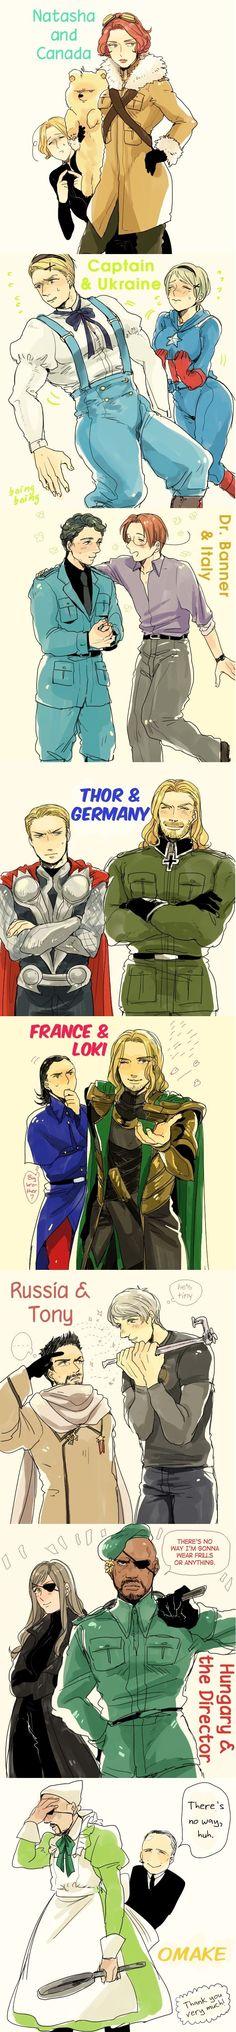 Hetalia with Marvel Characters